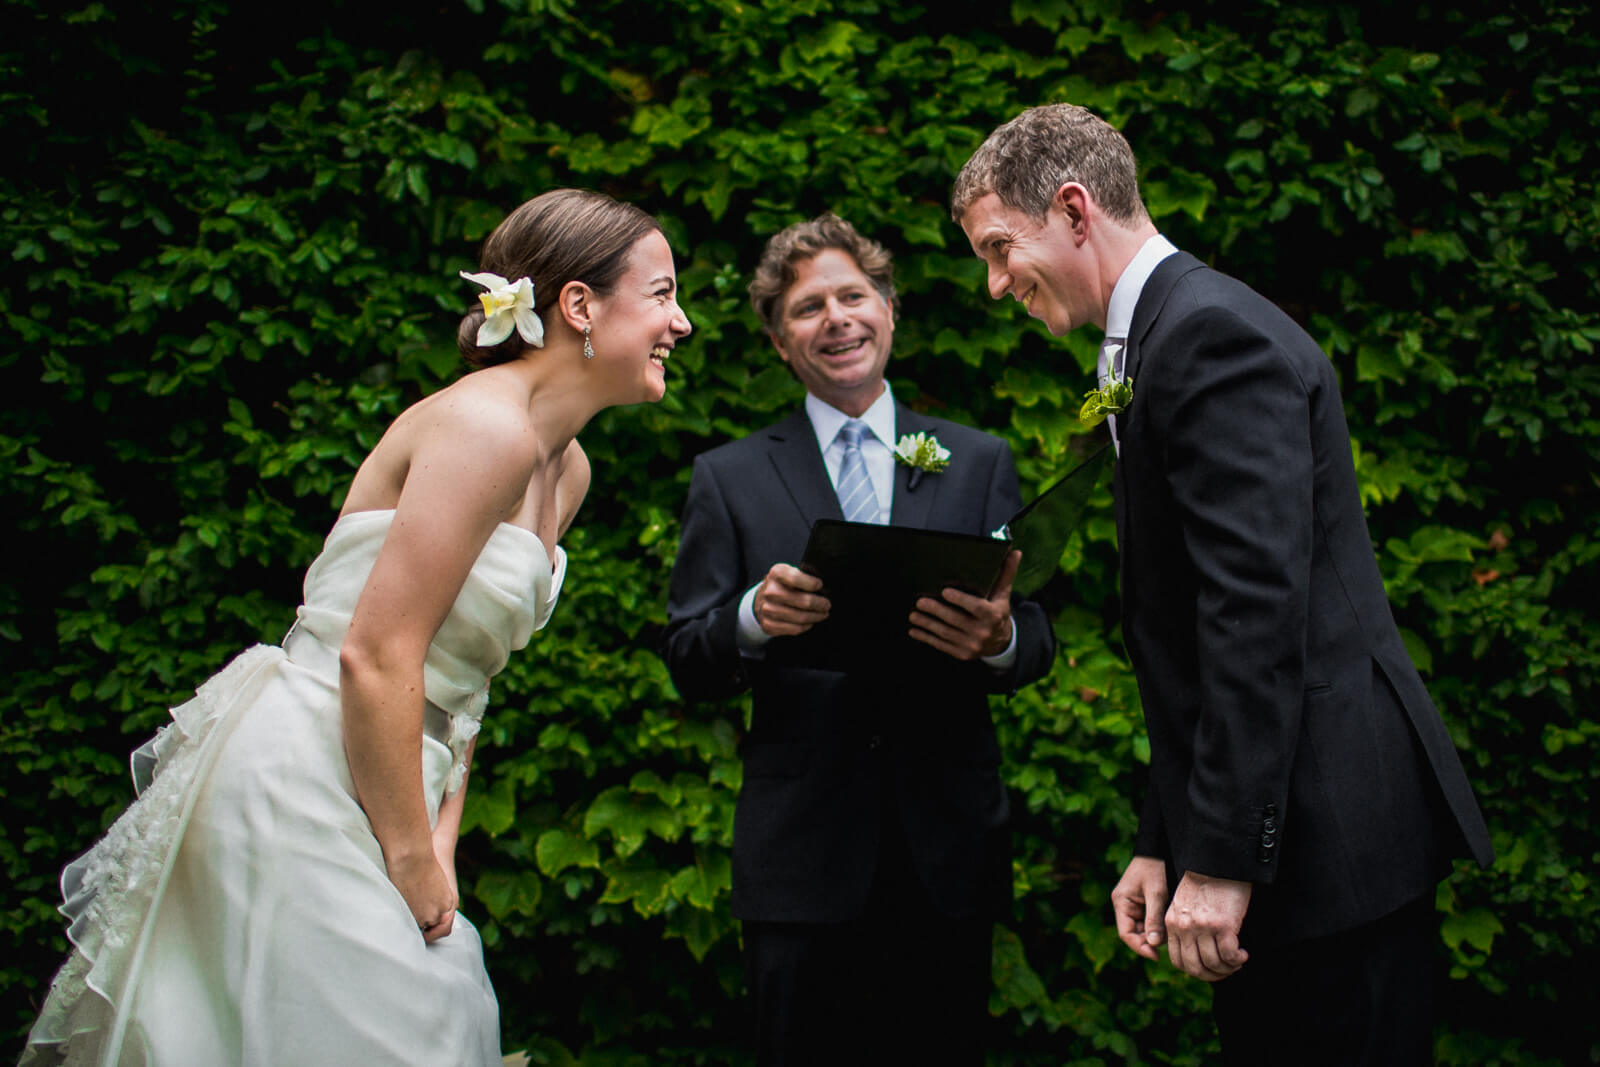 Chicago Wedding Photographers: Chicago Wedding Photographer Steve Koo